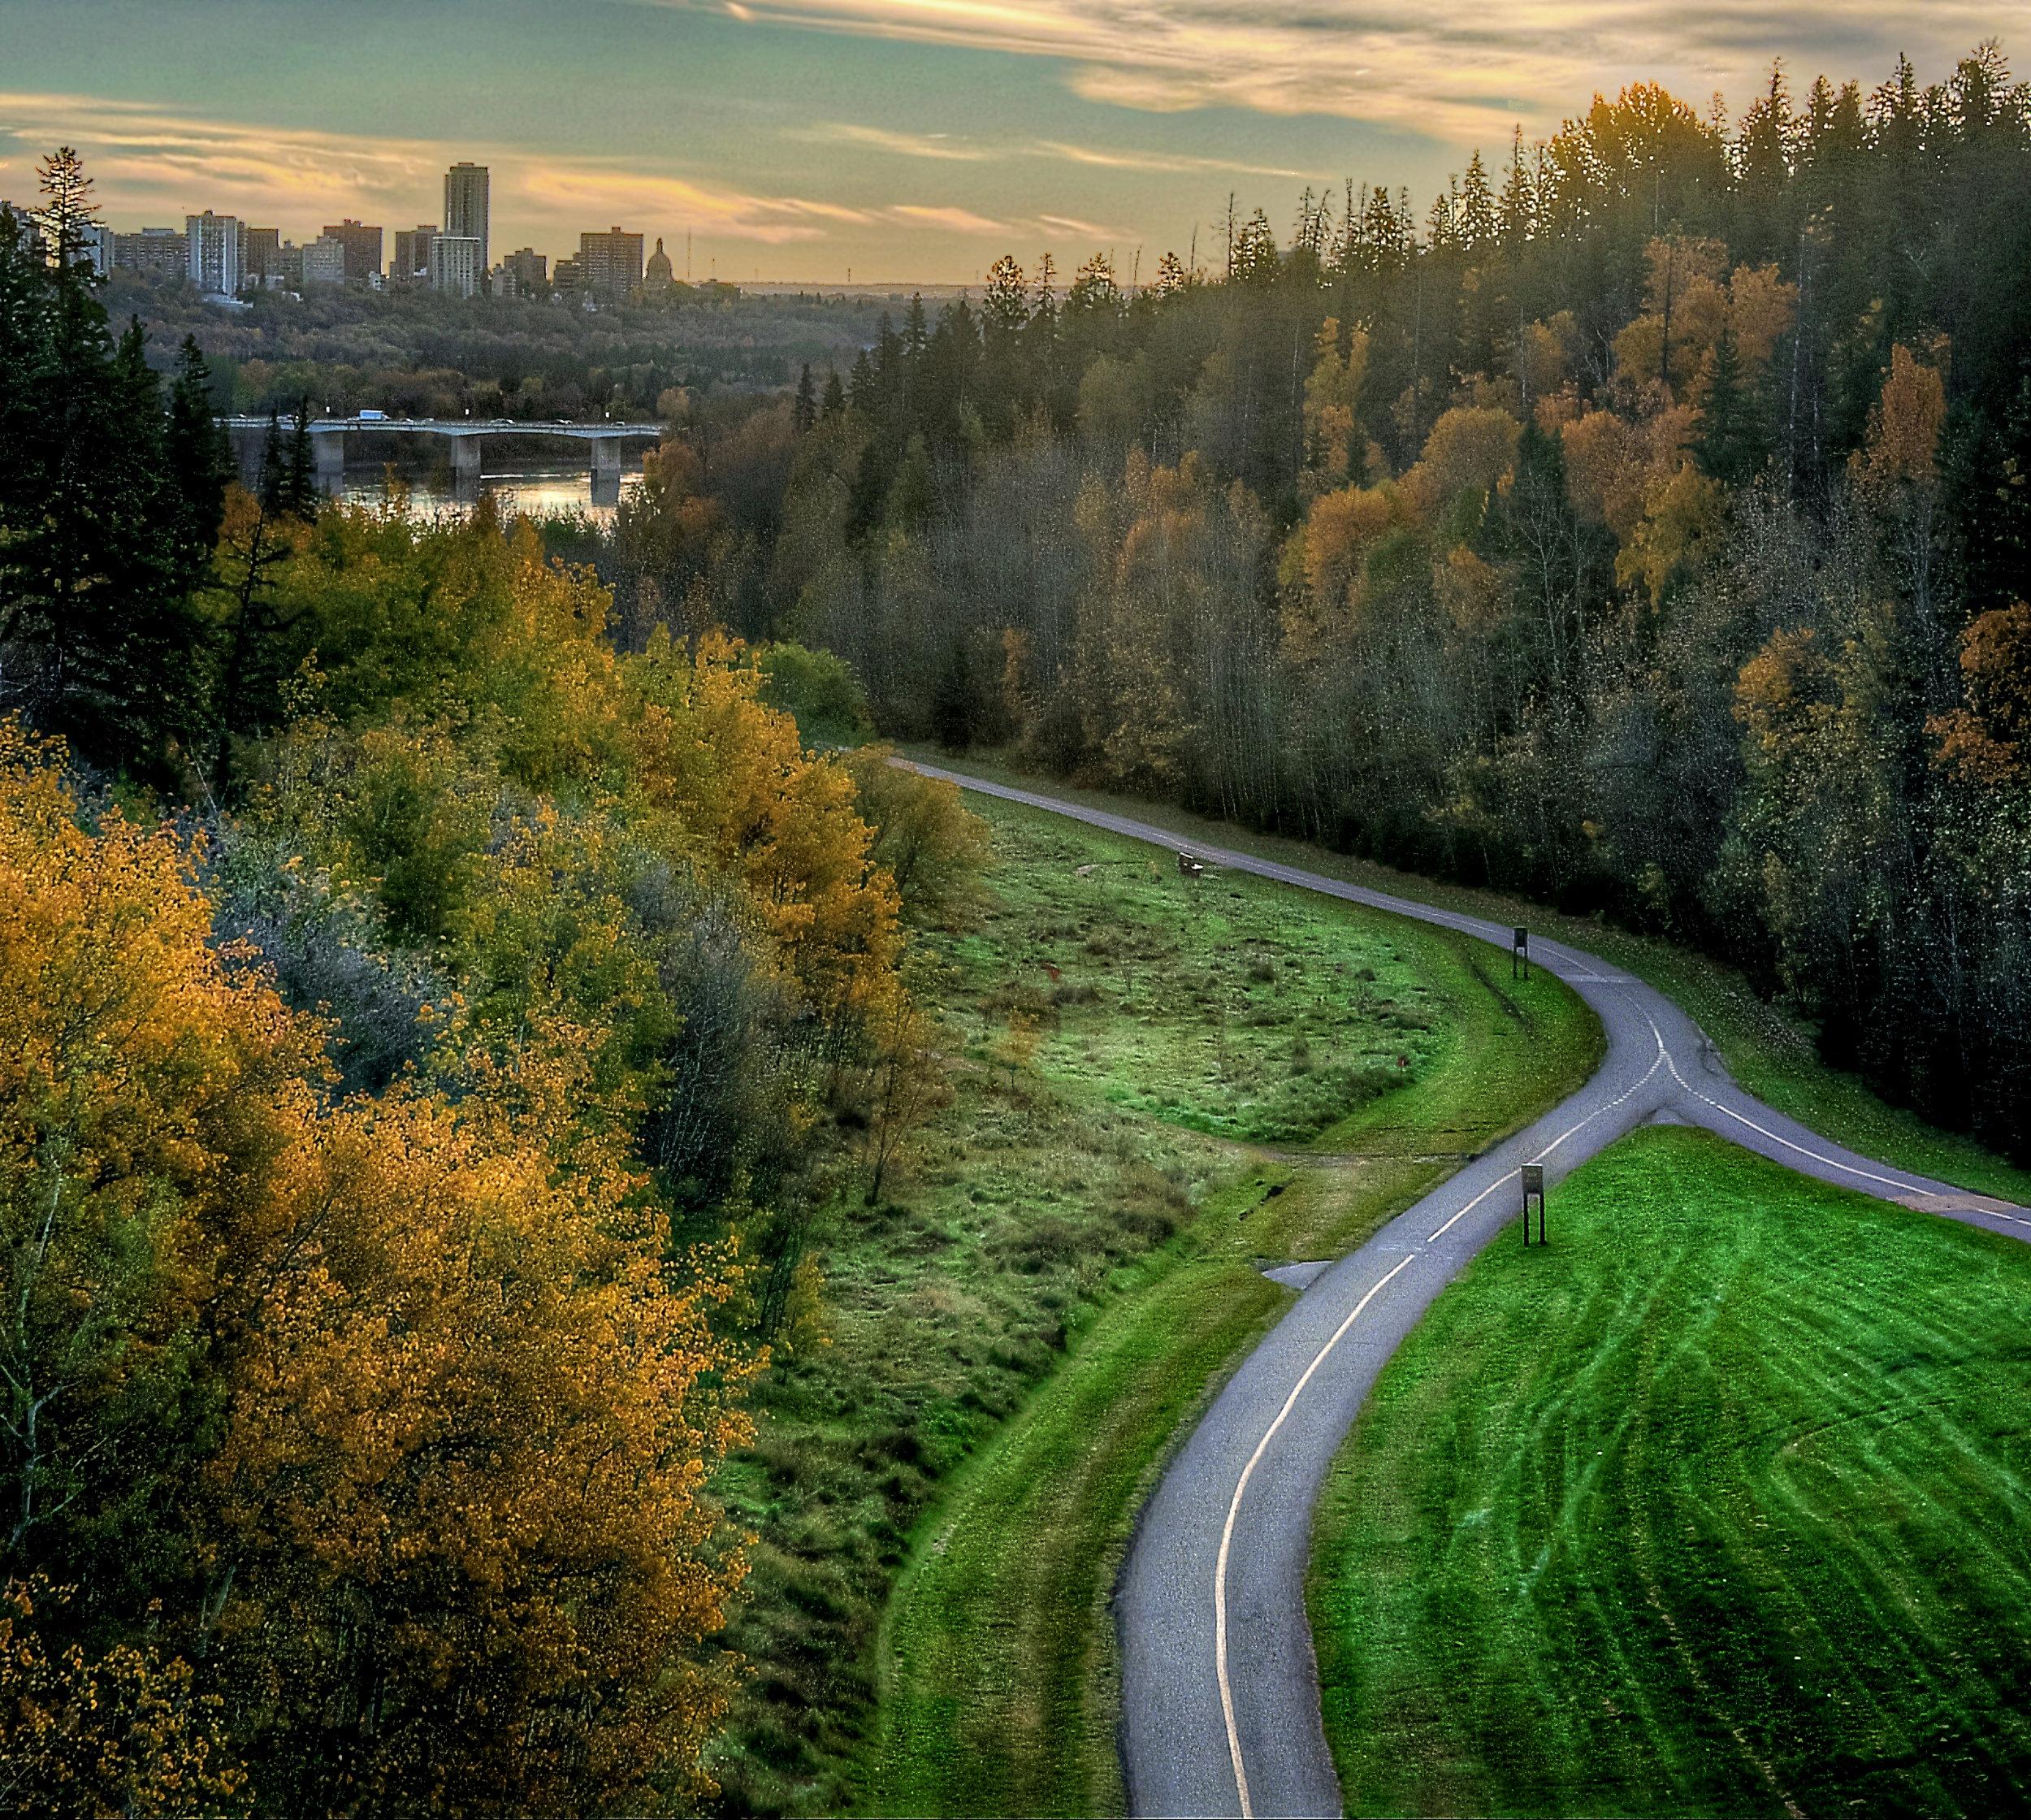 Ravine-Cycle-Path-Edmonton-Alberta-Canada-01A.jpg